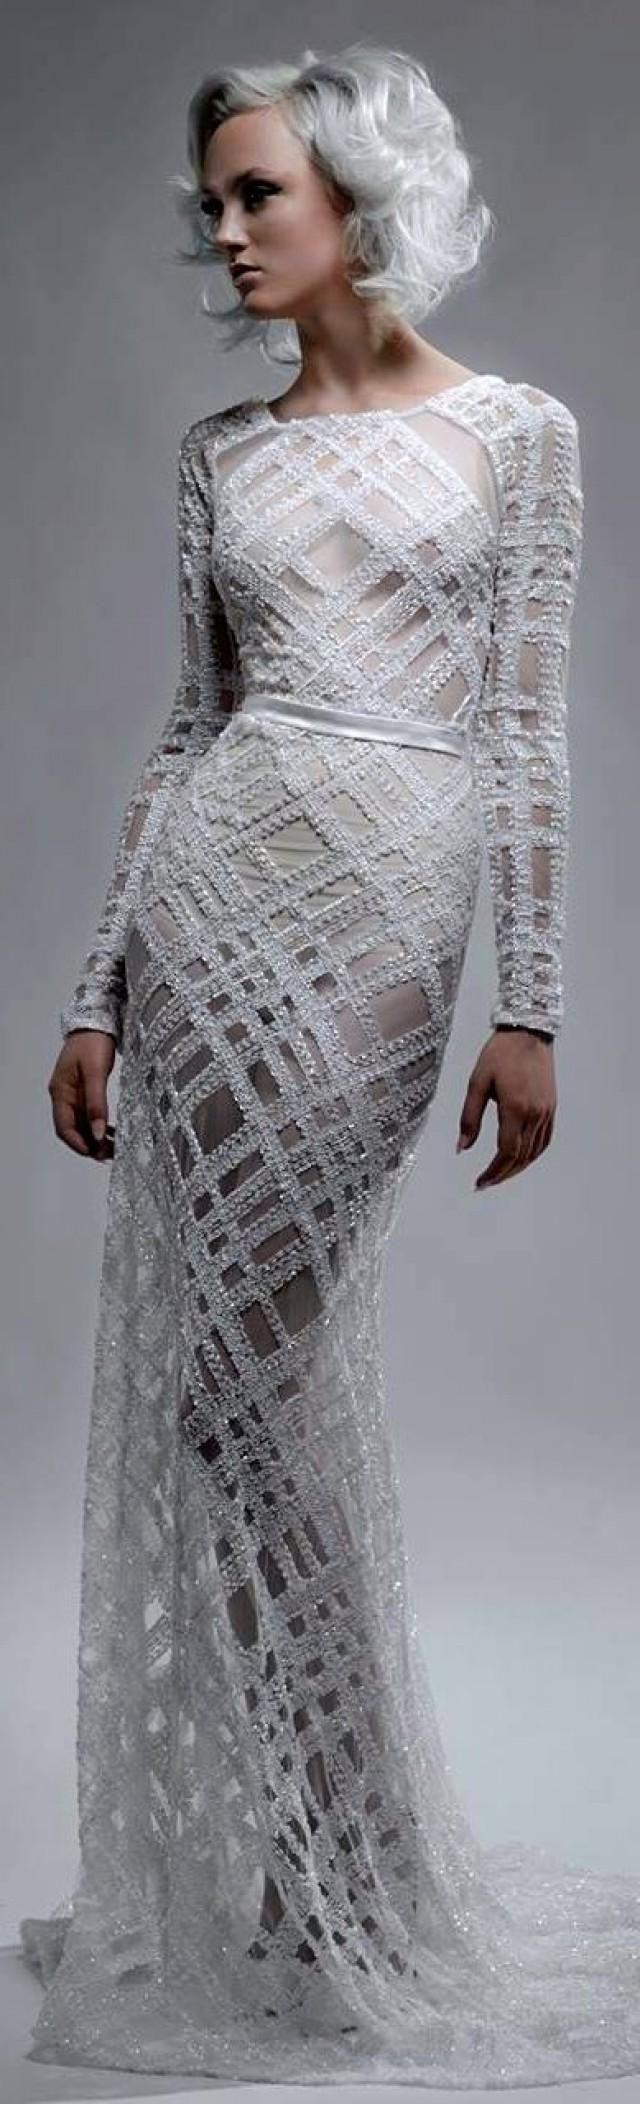 Wedding Dress by Paolo Sebastian